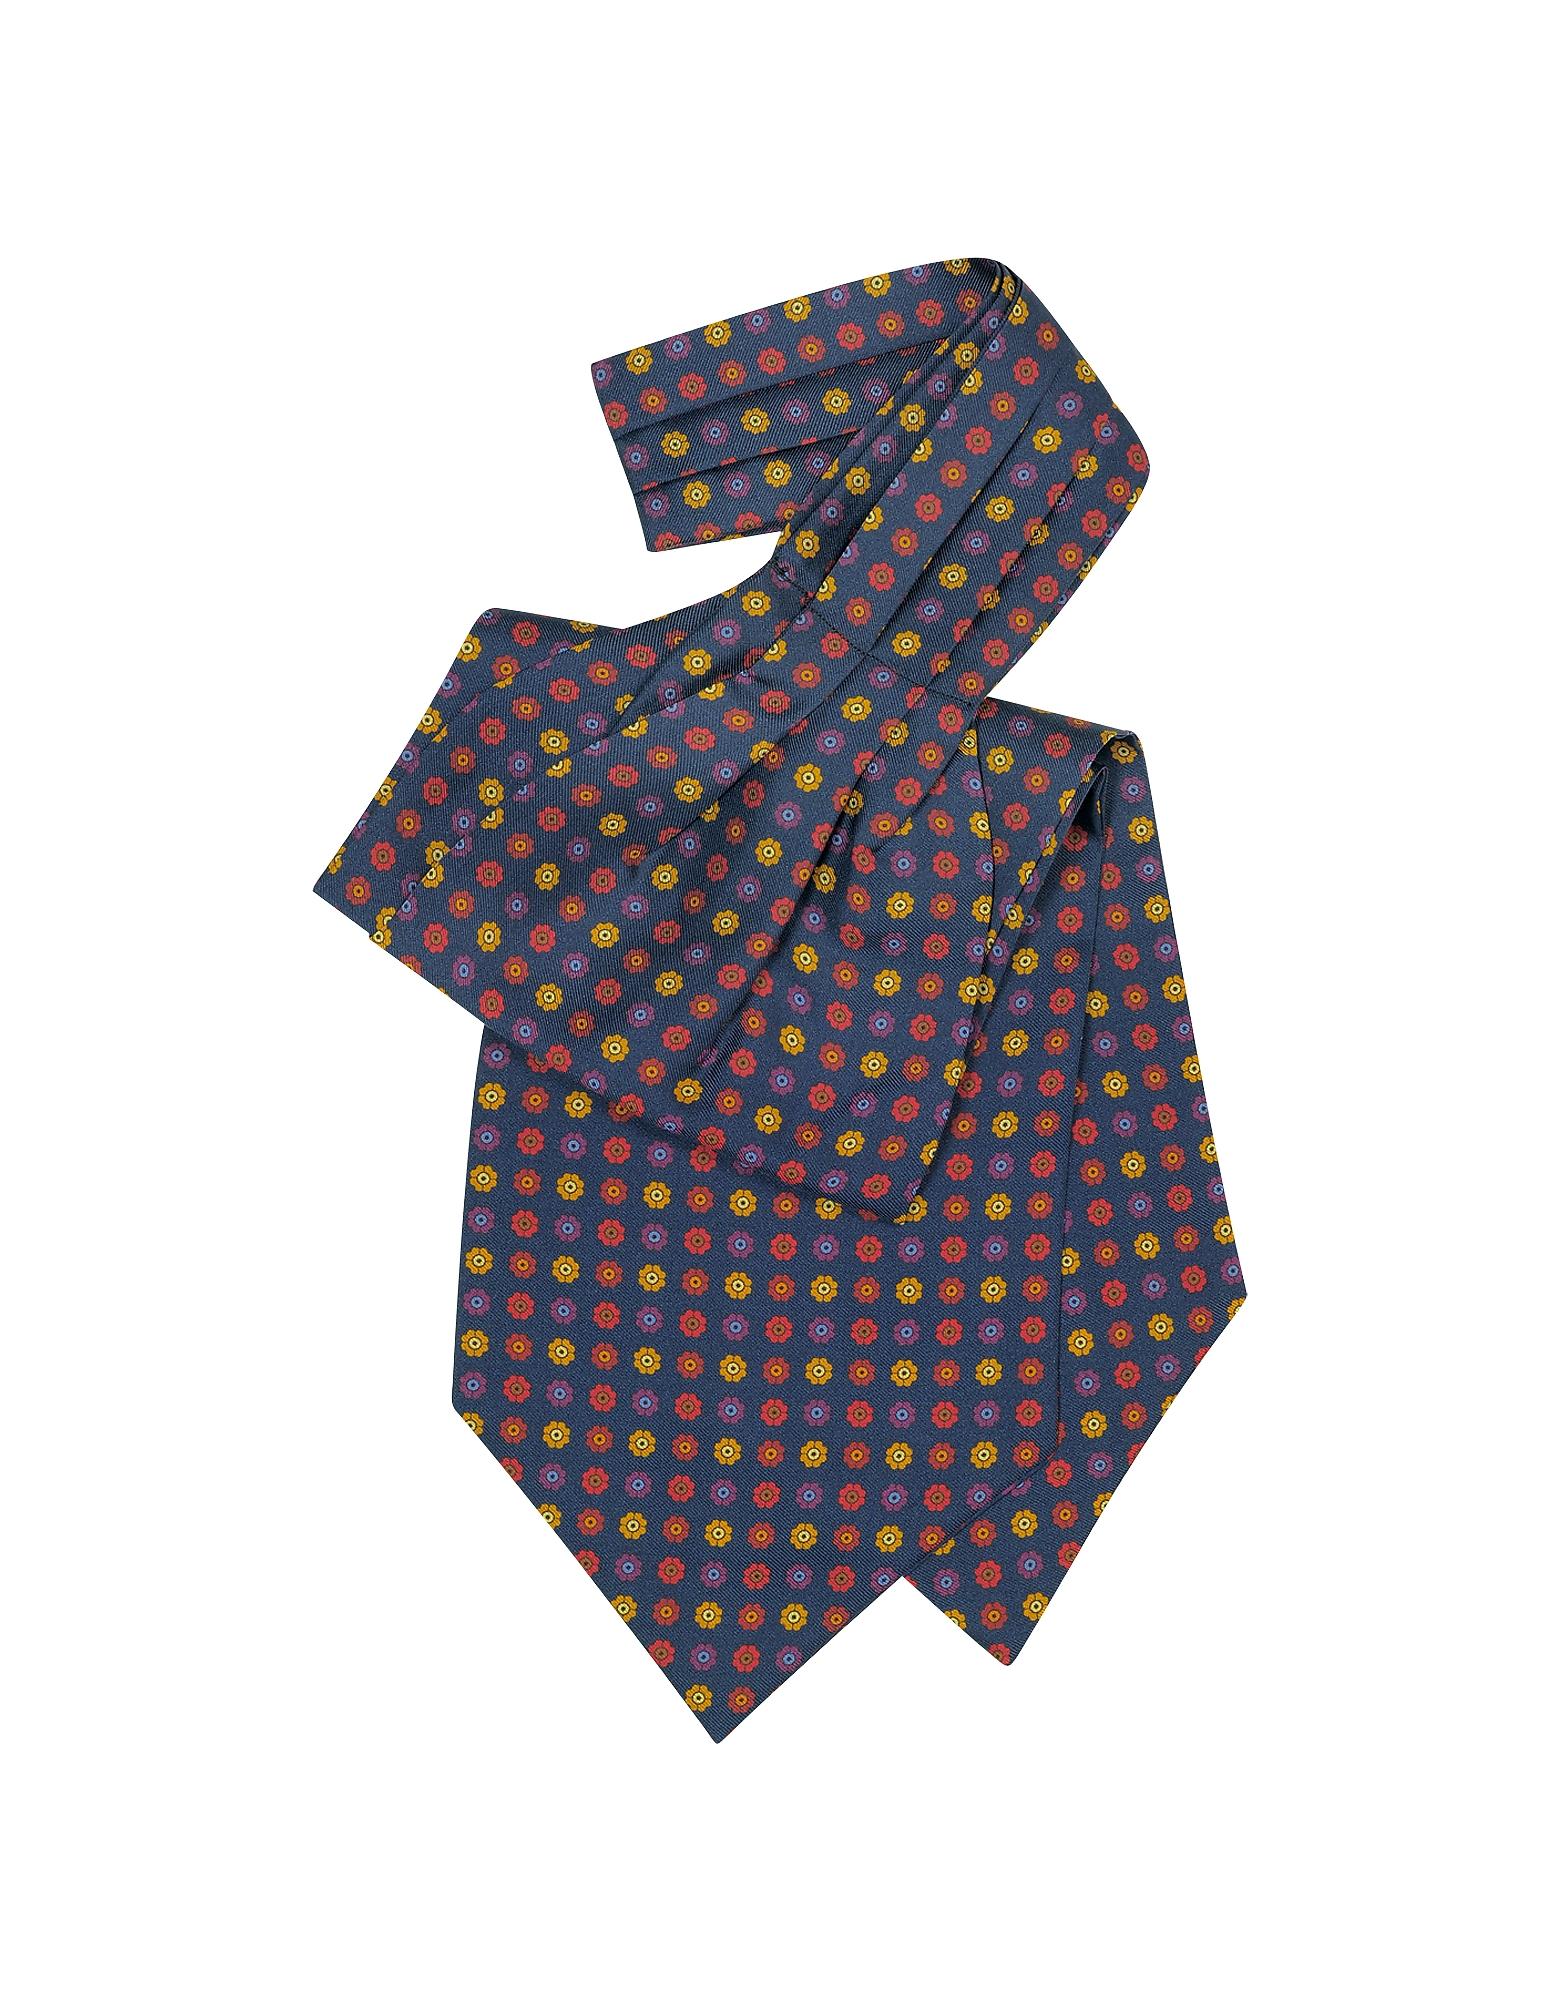 Forzieri Designer Ascot ties, Floral Print Silk Tie Ascot